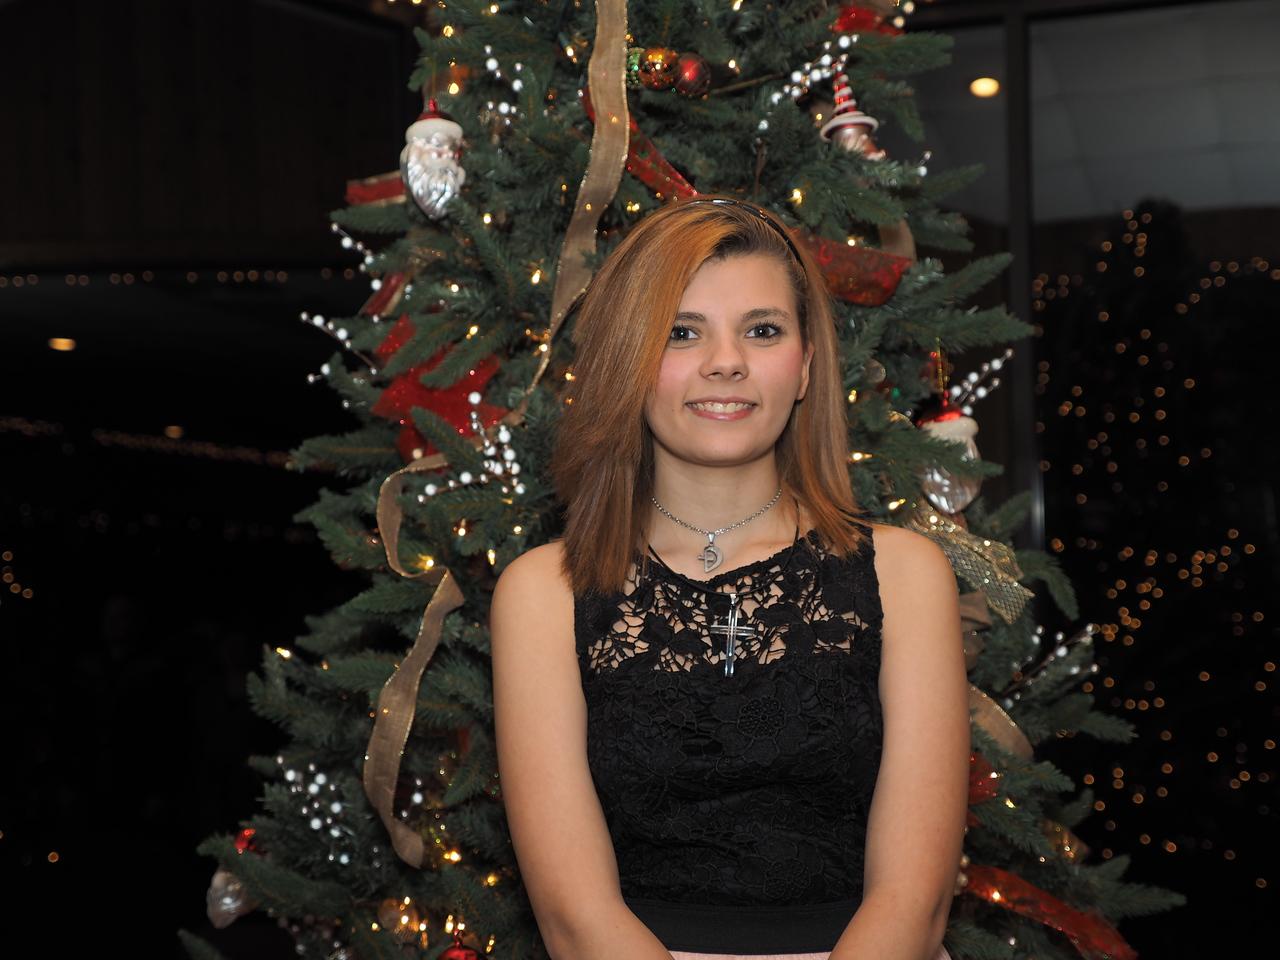 ChristmasPrty_SQD185054_OMD10040_Org